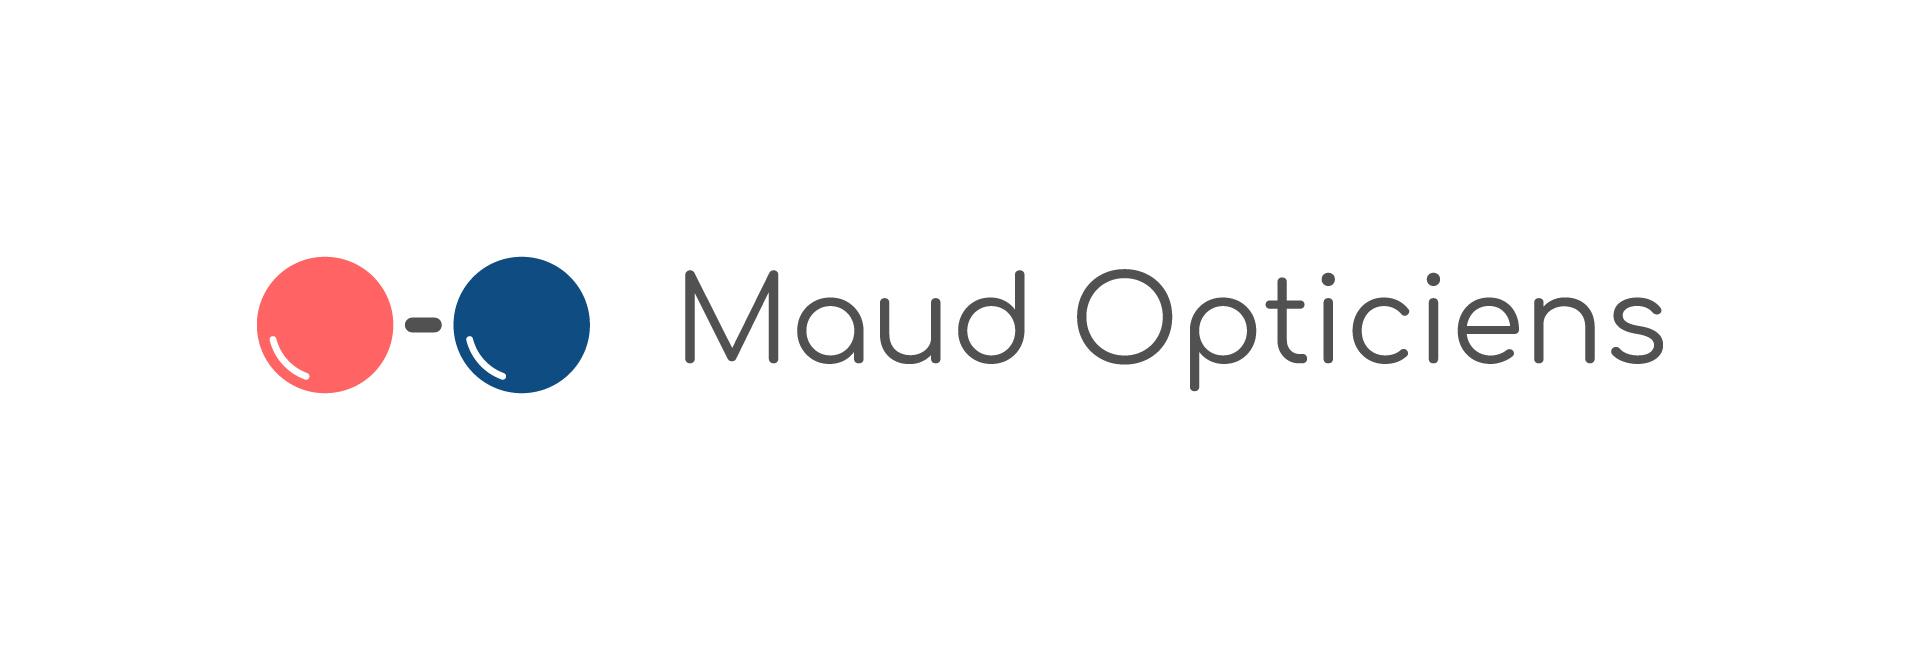 Logo-MAUD-OPTICIENS_Simp-LARGE